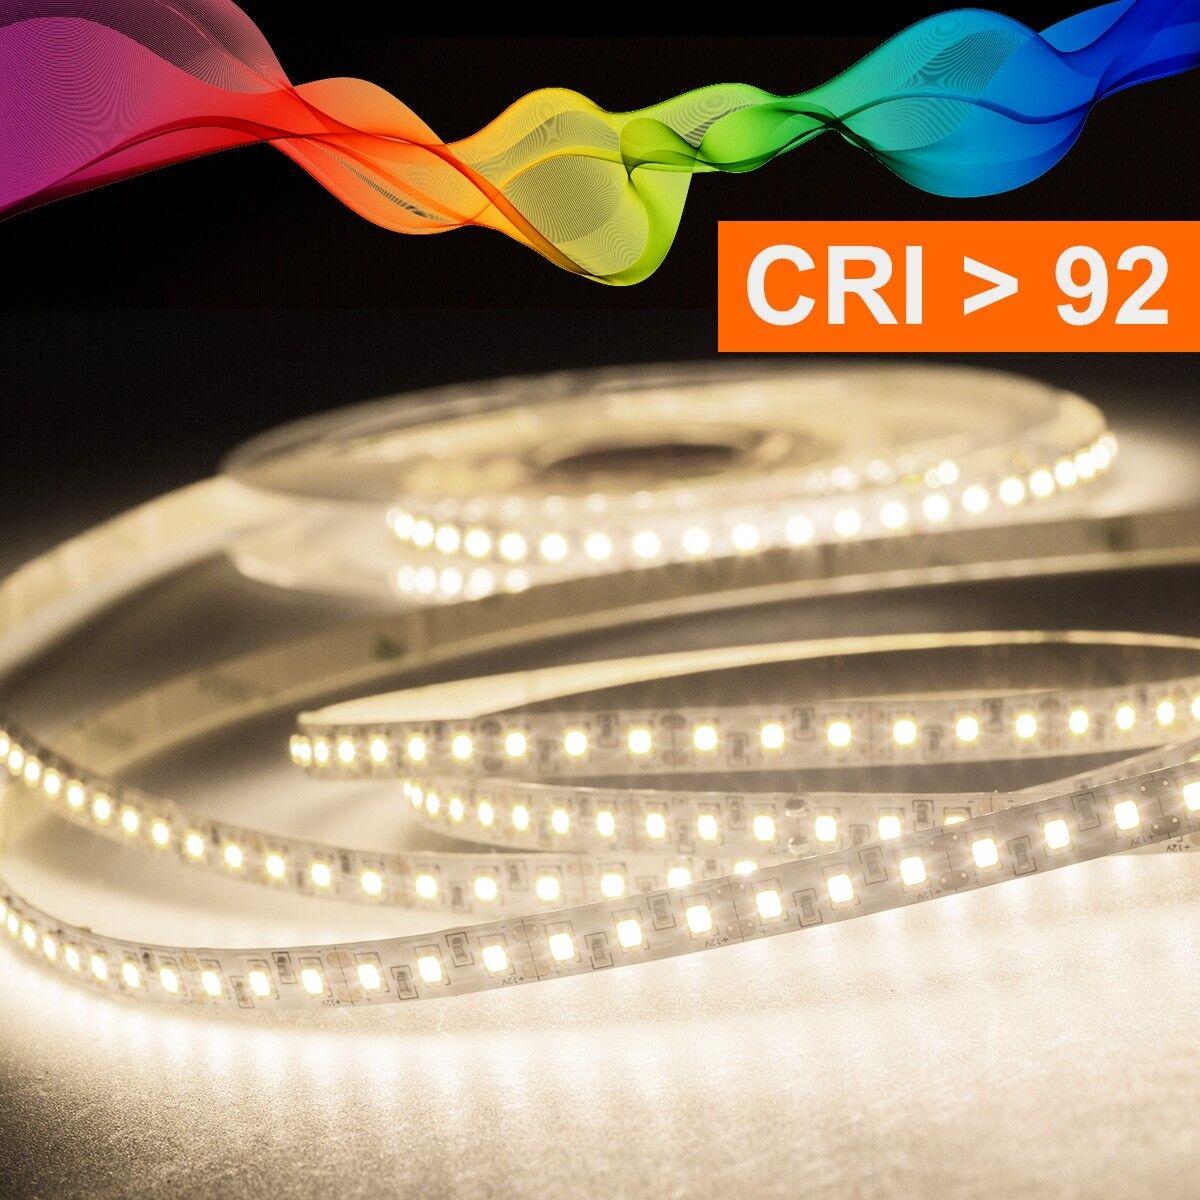 LED Strip 2835 Neutralweiß (4000k) CRI 92 72W 5 Meter 24V IP20  | Neuartiges Design